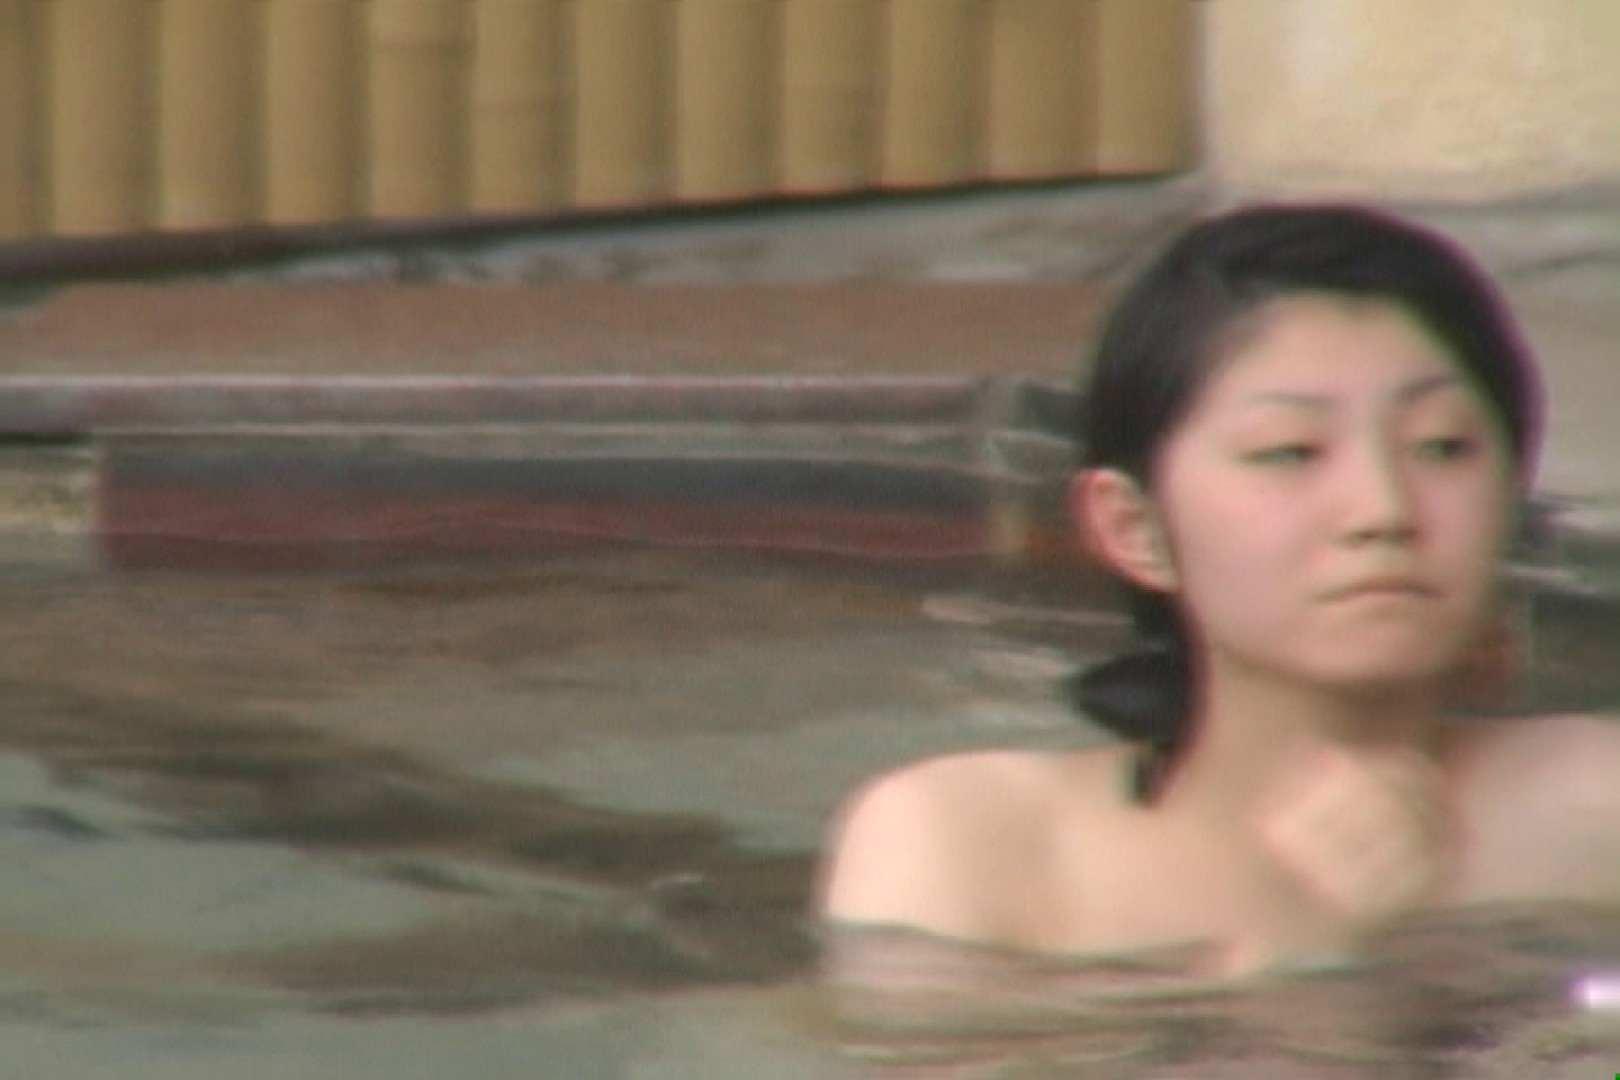 Aquaな露天風呂Vol.579 OL女体 | 露天  72連発 10